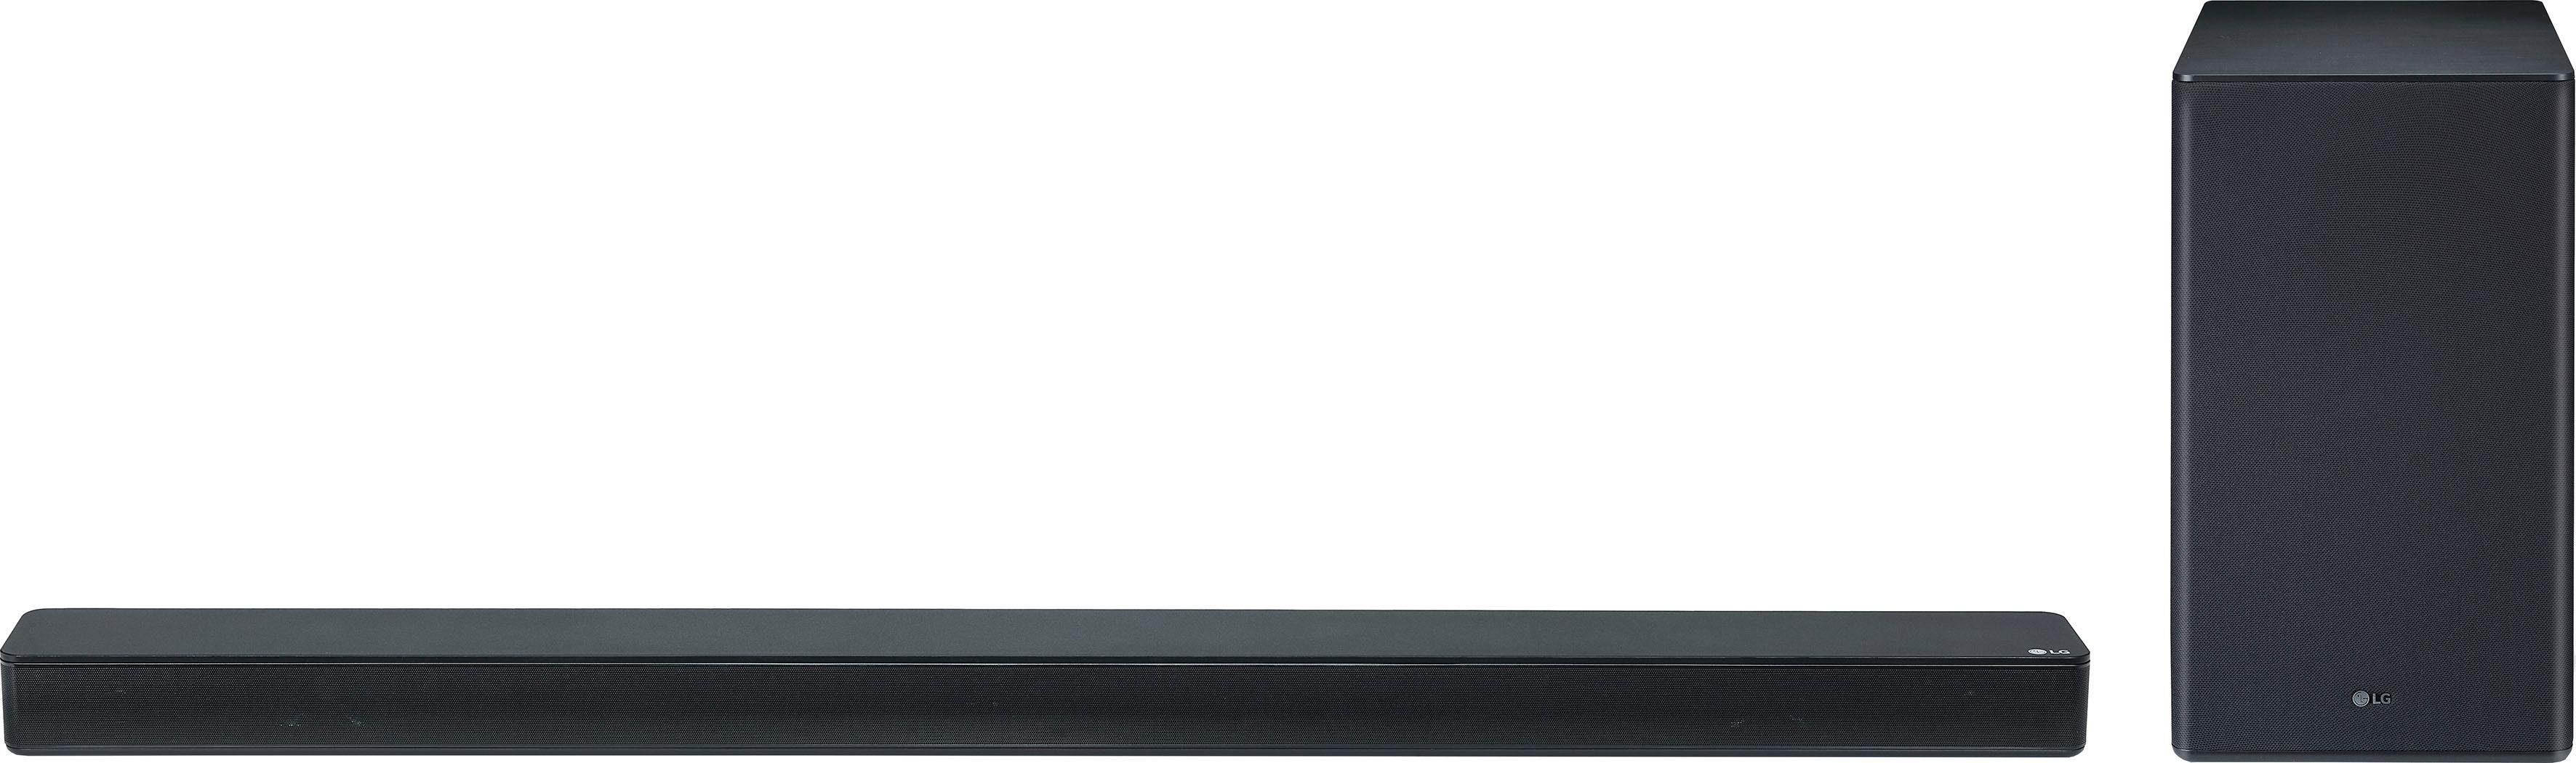 LG SK8 2.1 Soundbar (WLAN (WiFi), Bluetooth, LAN (Ethernet), Chromecast, Hi-Res, 360 W)